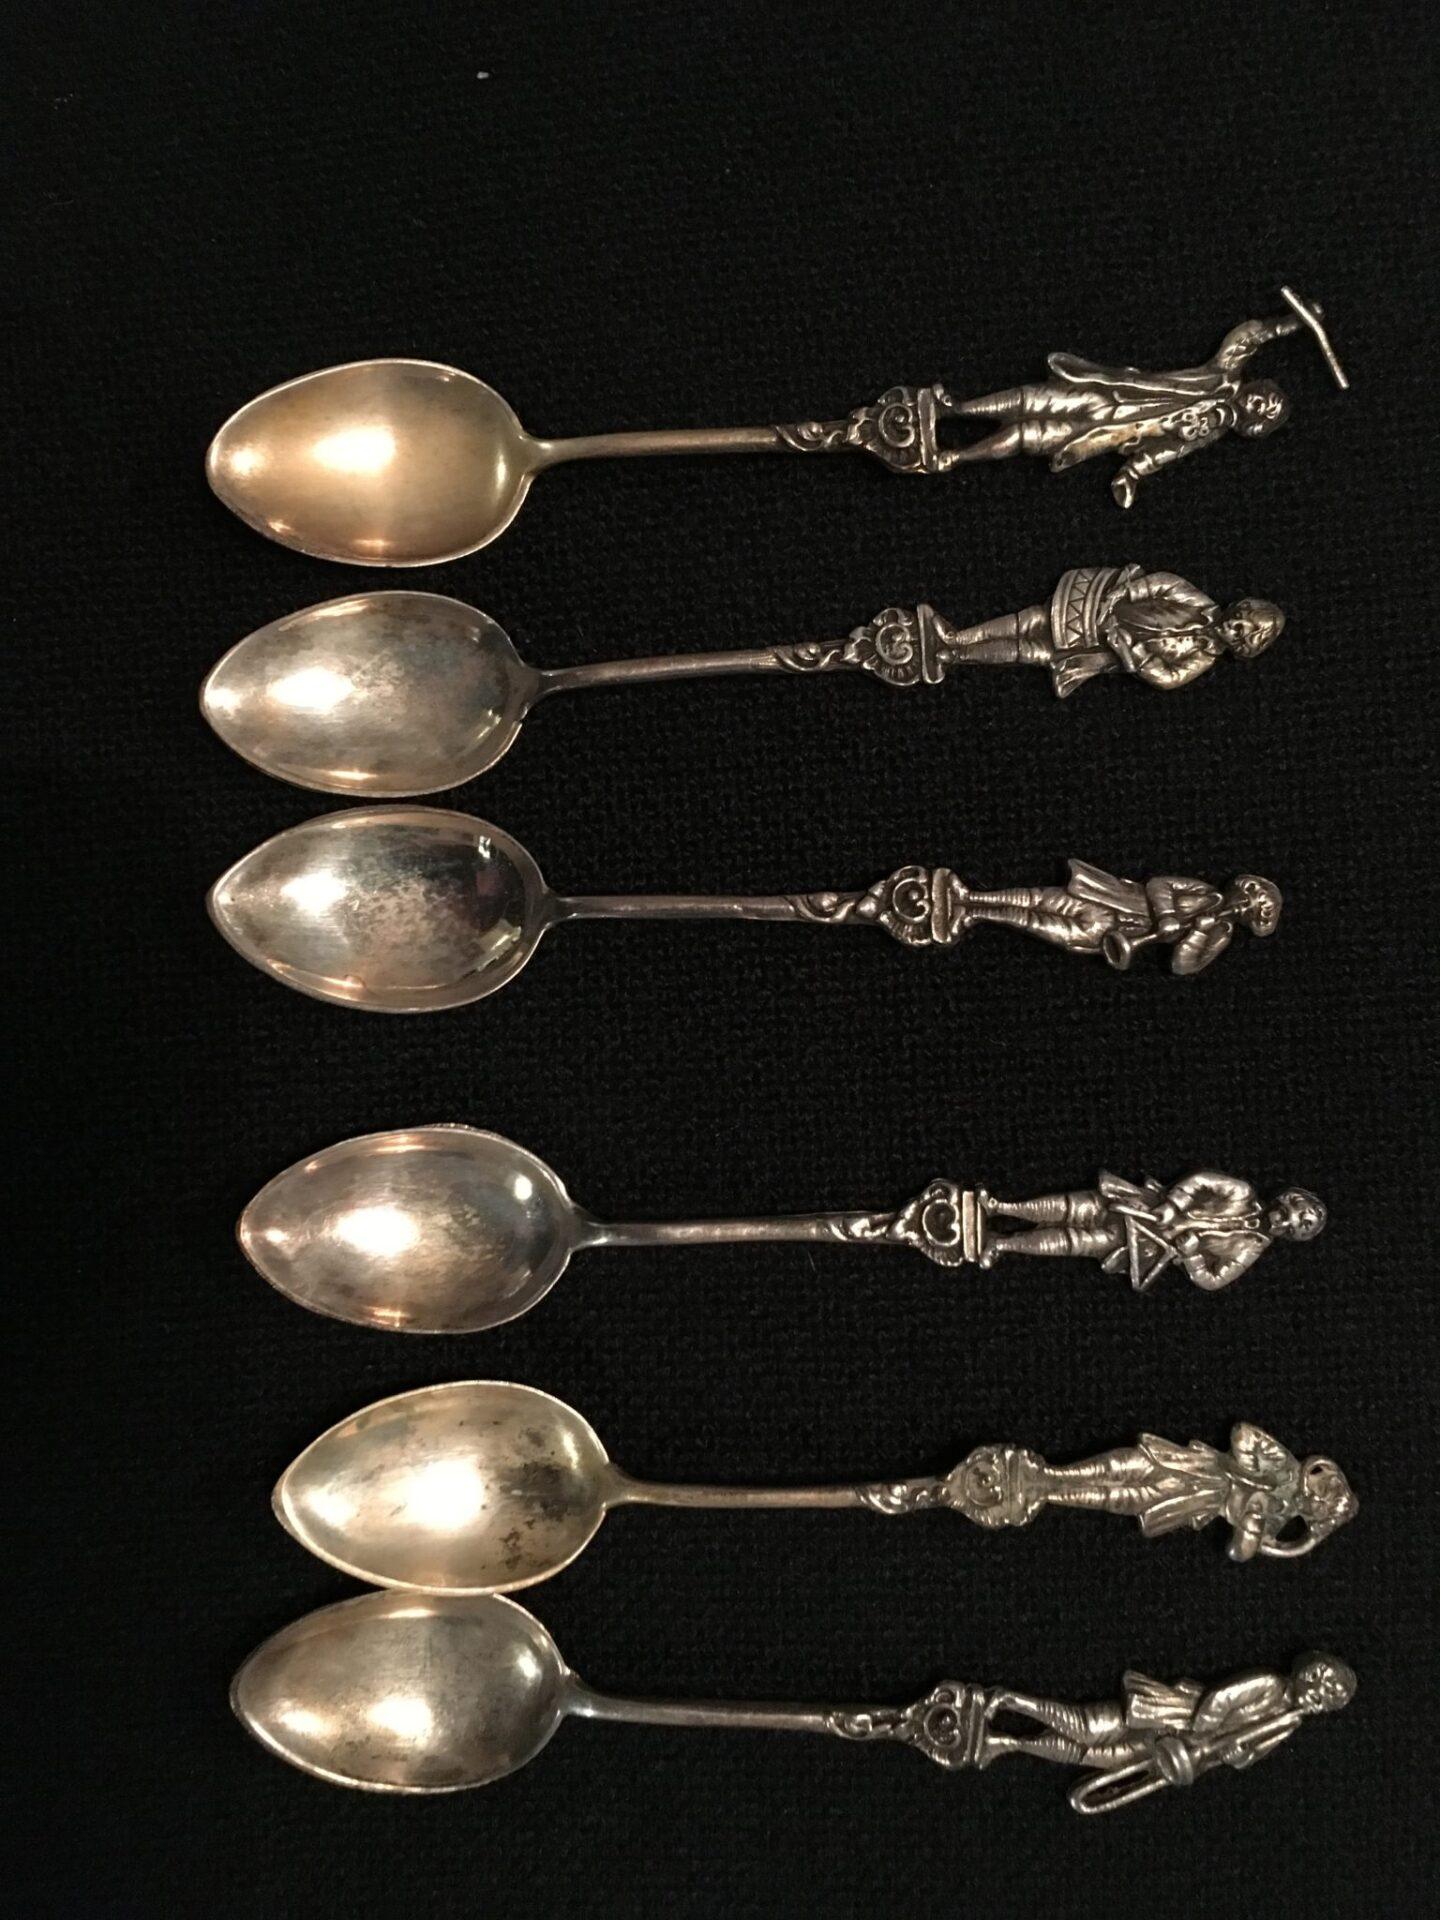 6 stk sølv teskeer med musikanter pris i alt  350 kr